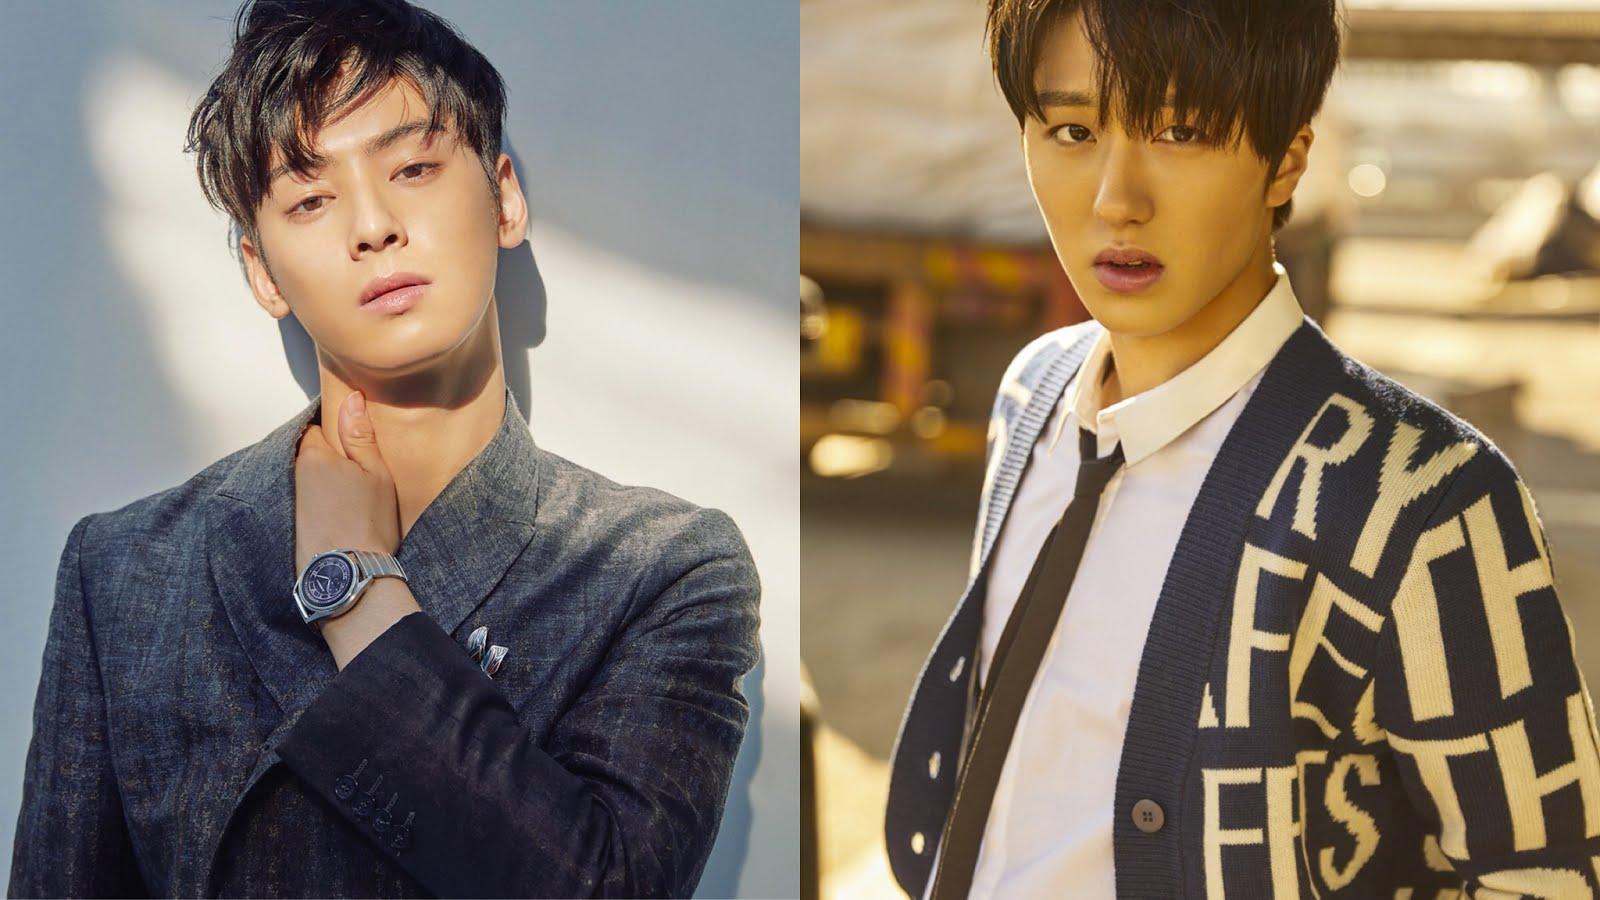 Cha Eun Woo and Chan Hee to appear on 'Baek Jong Won's Alley